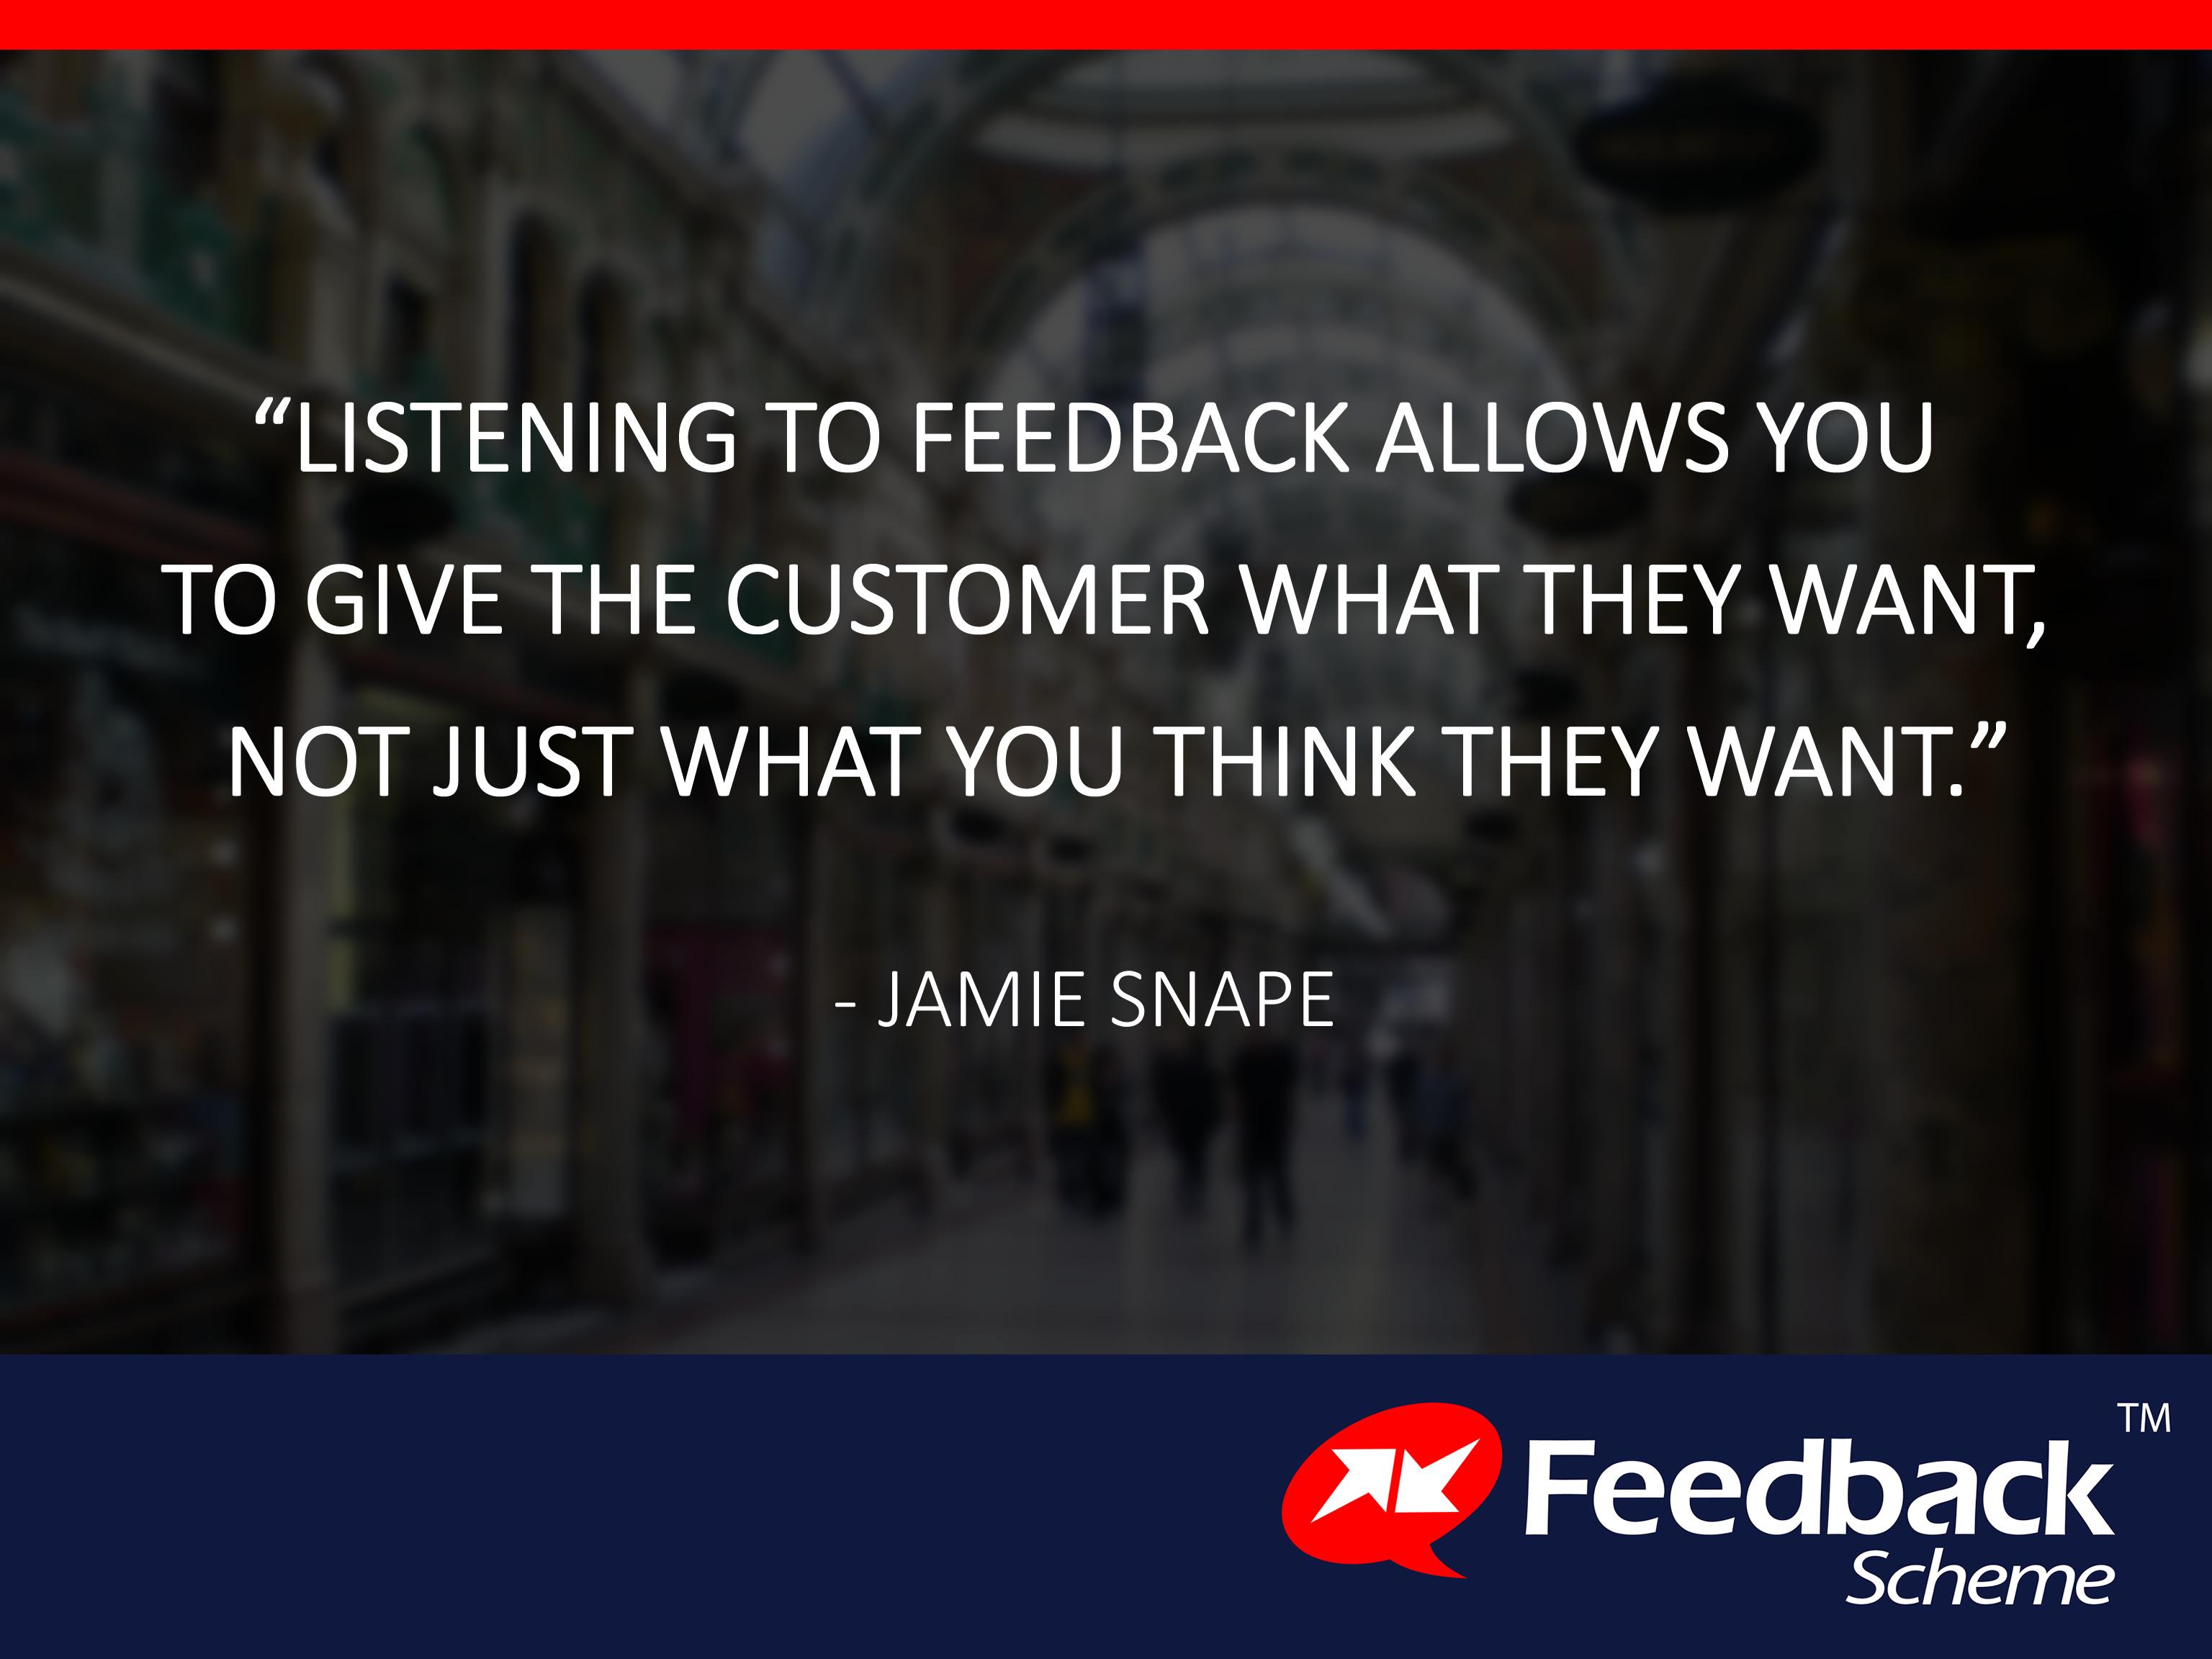 Listening to feedback